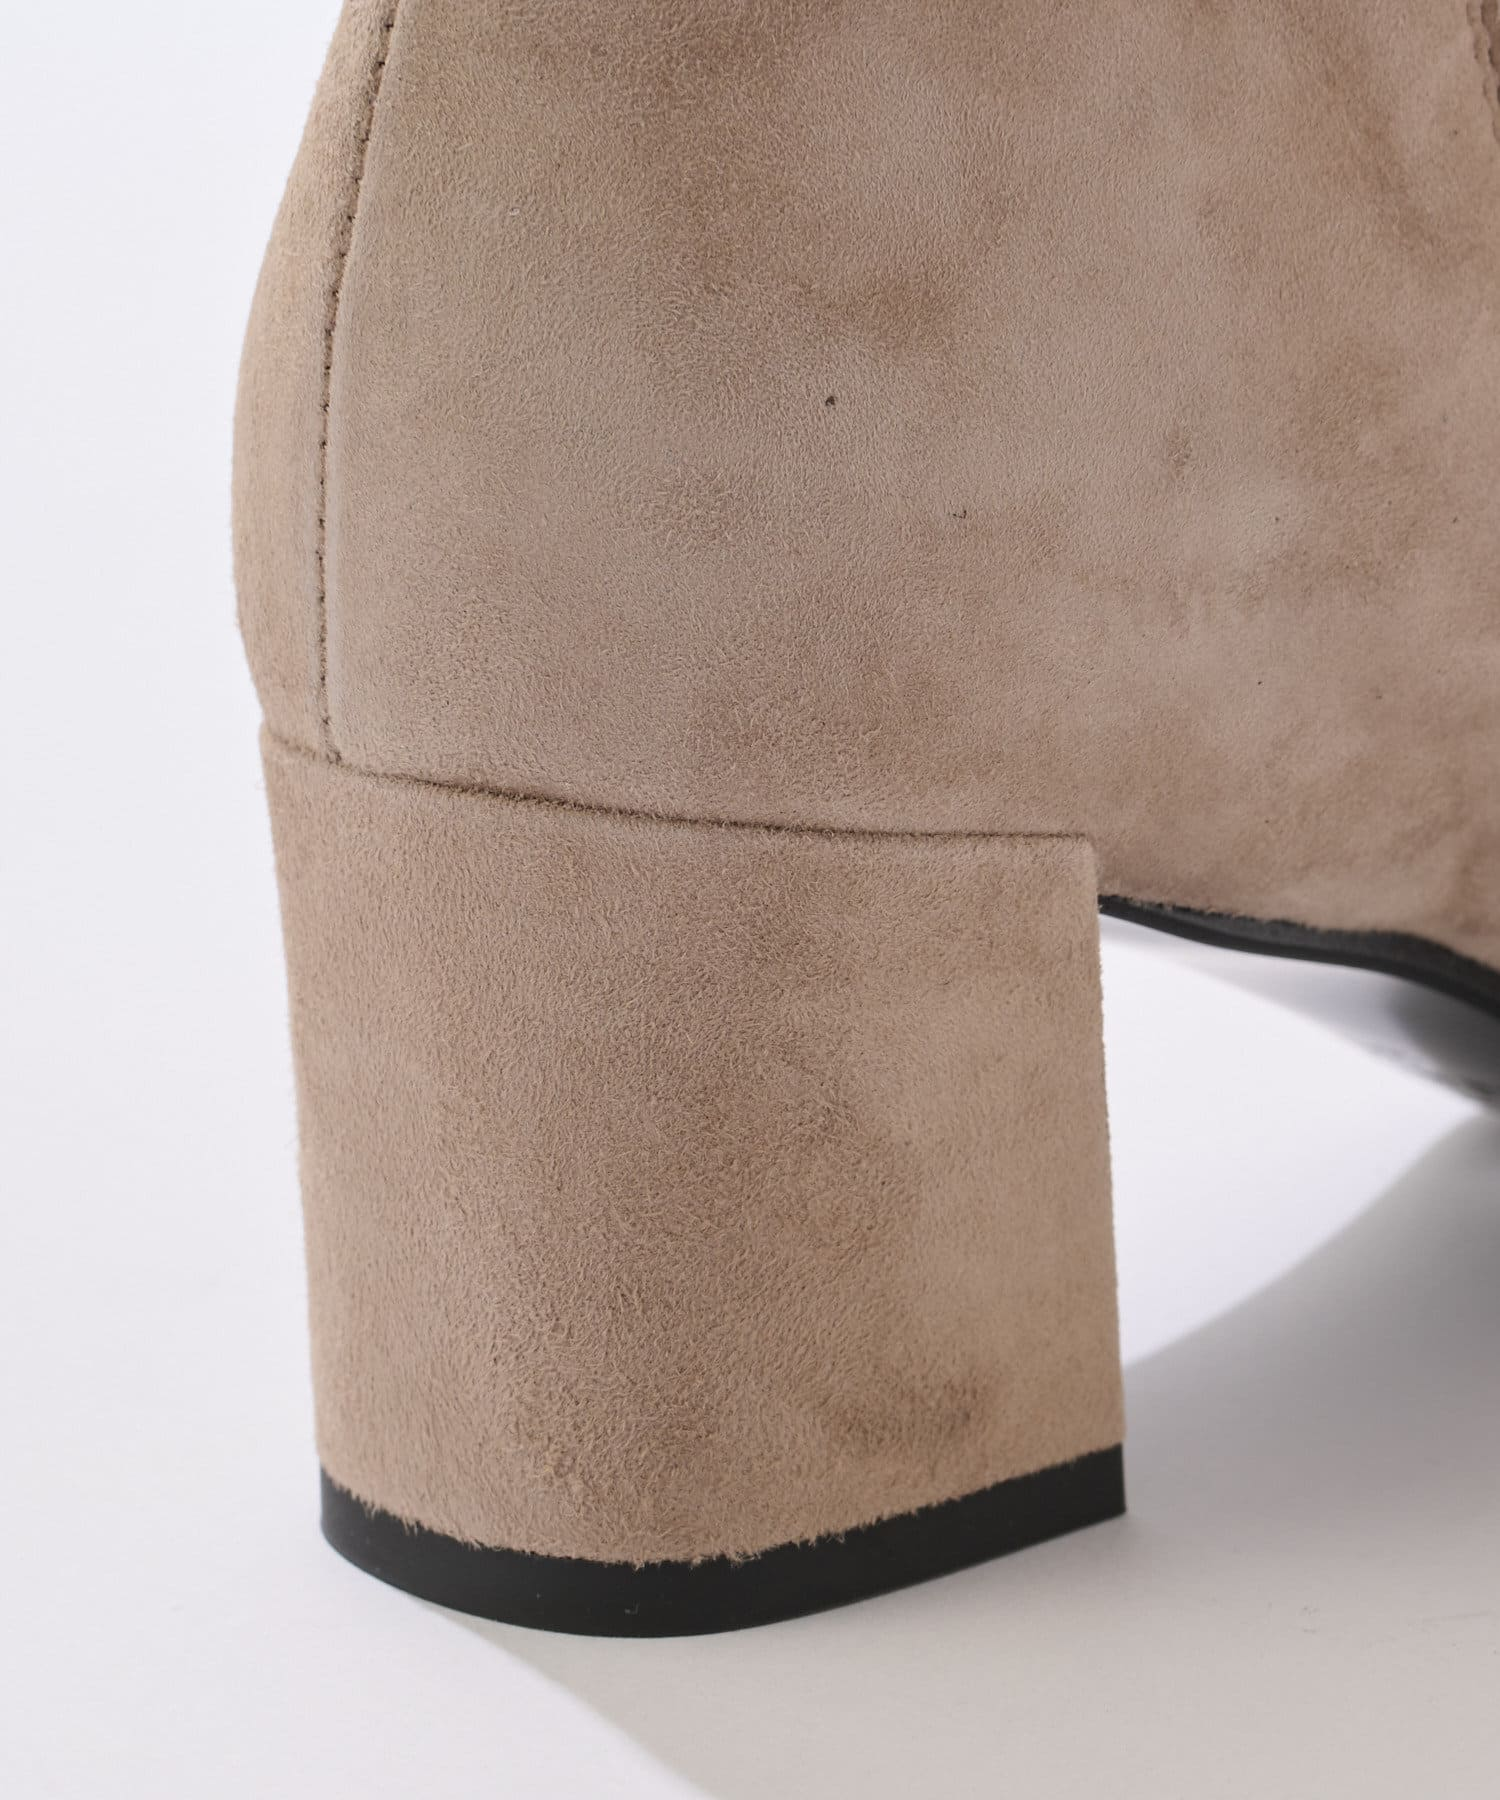 La boutique BonBon(ラブティックボンボン) 《予約》【FABIO RUSCONI】スエードショートブーツ